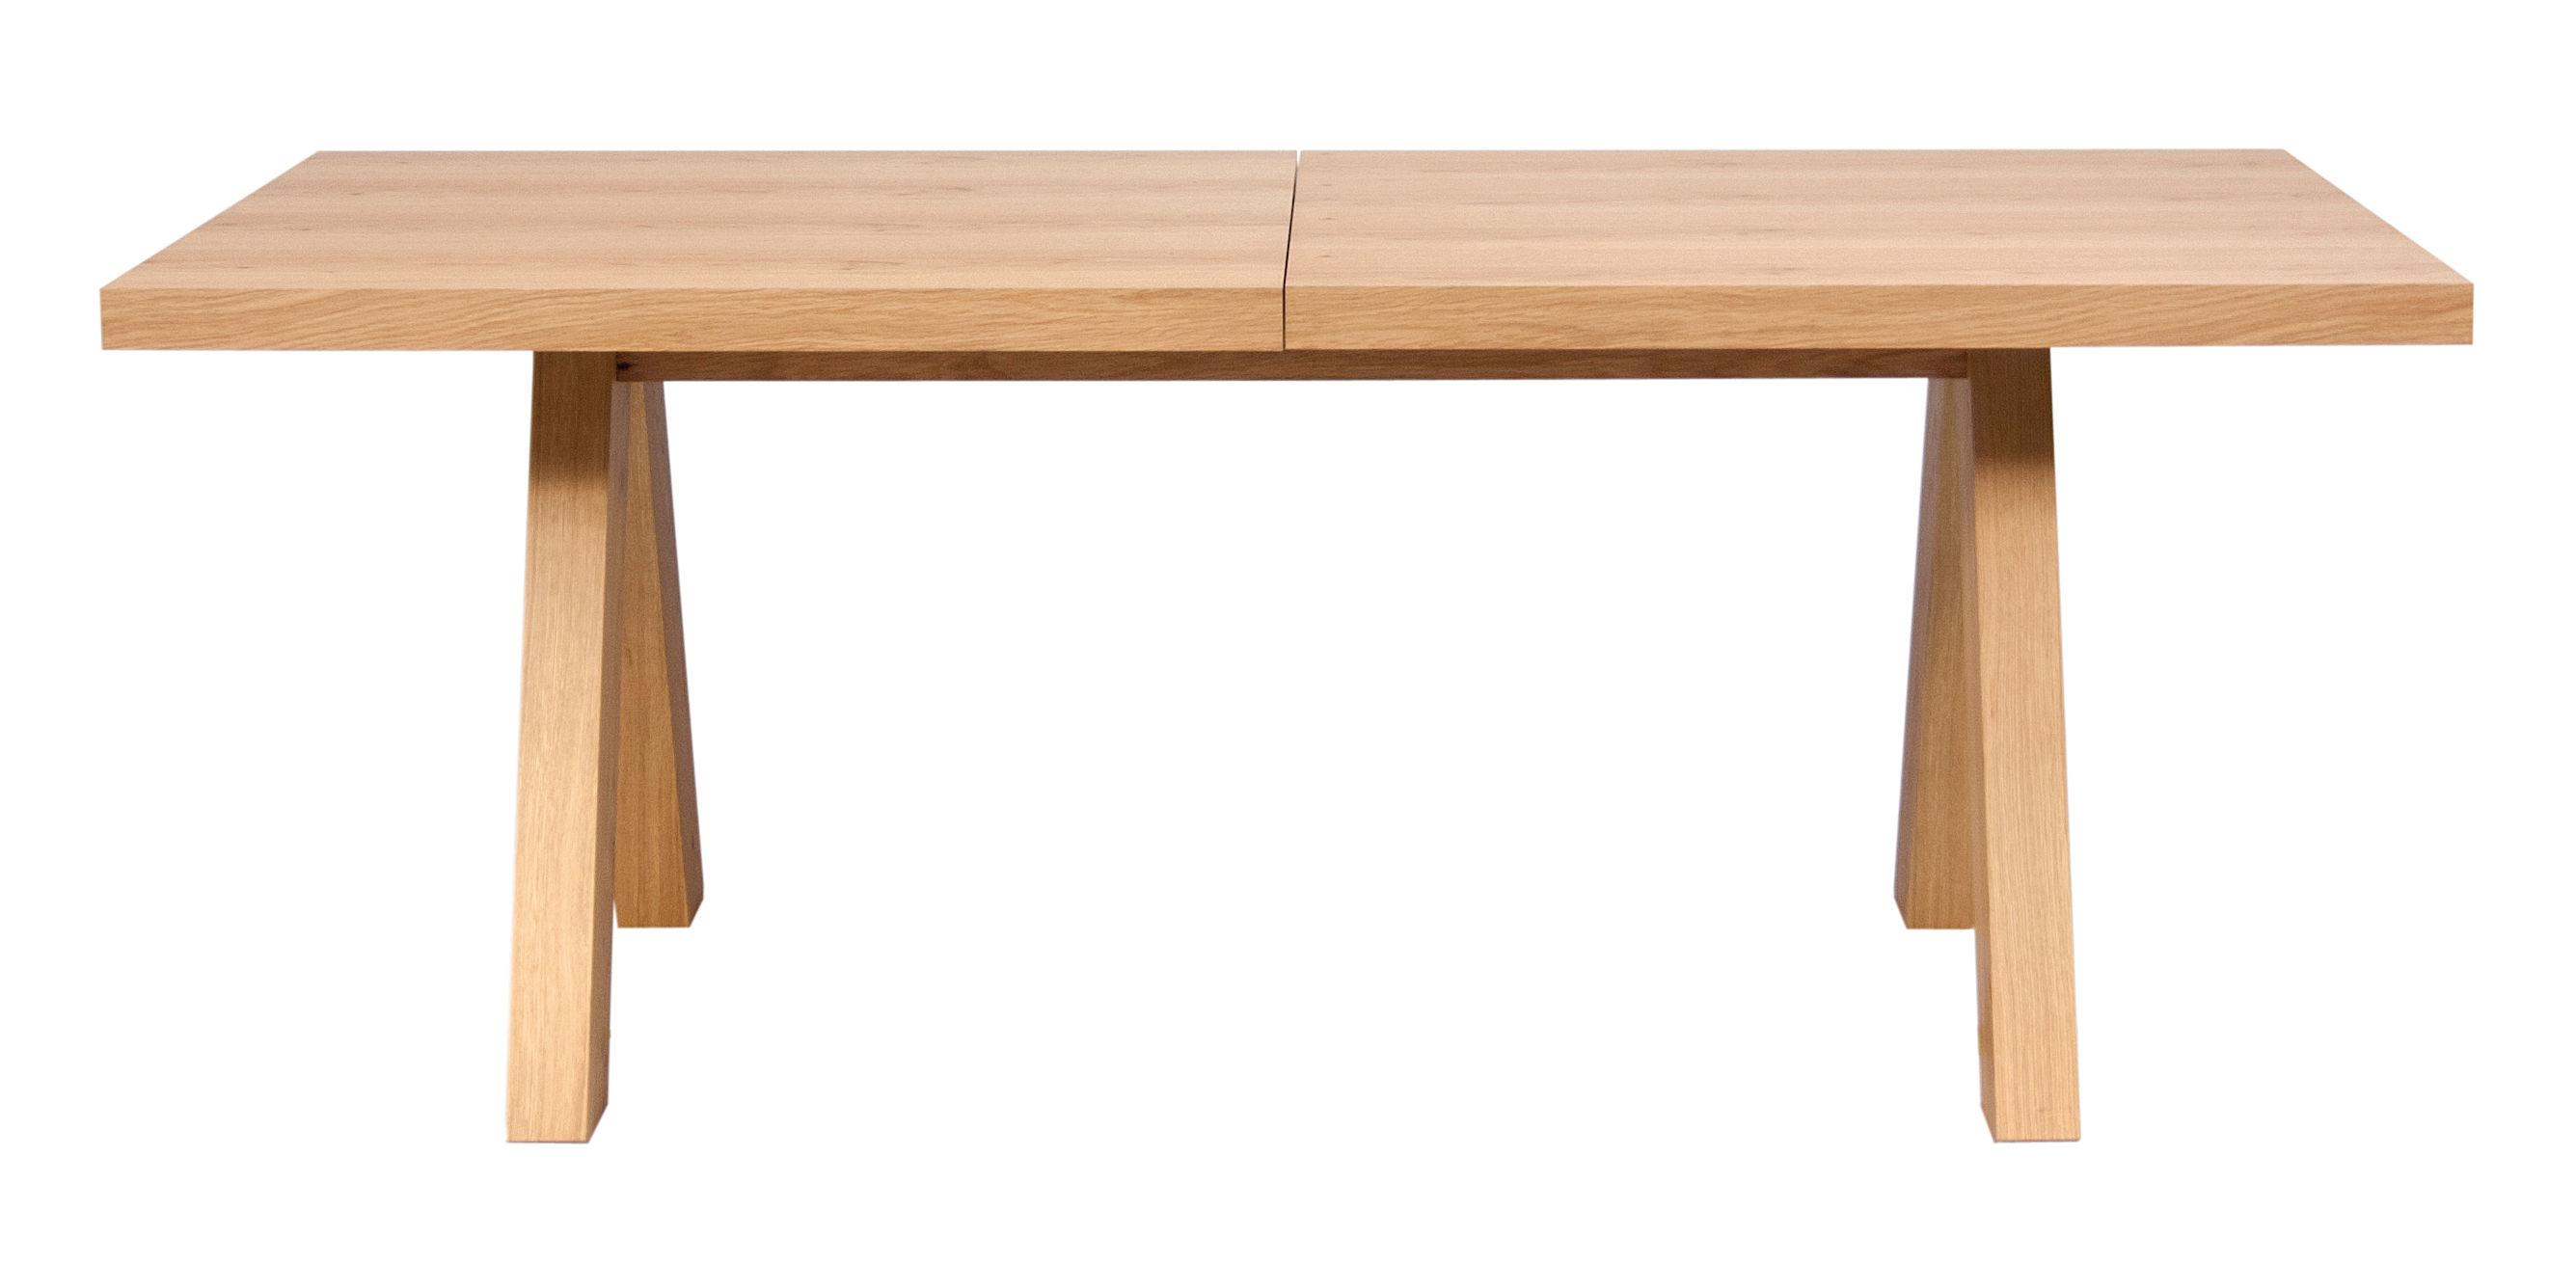 Furniture - Dining Tables - Oak Extending table - L 200 to 250 cm by POP UP HOME - Wild oak - Honeycomb panels with oak veneer, MDF veneer oak